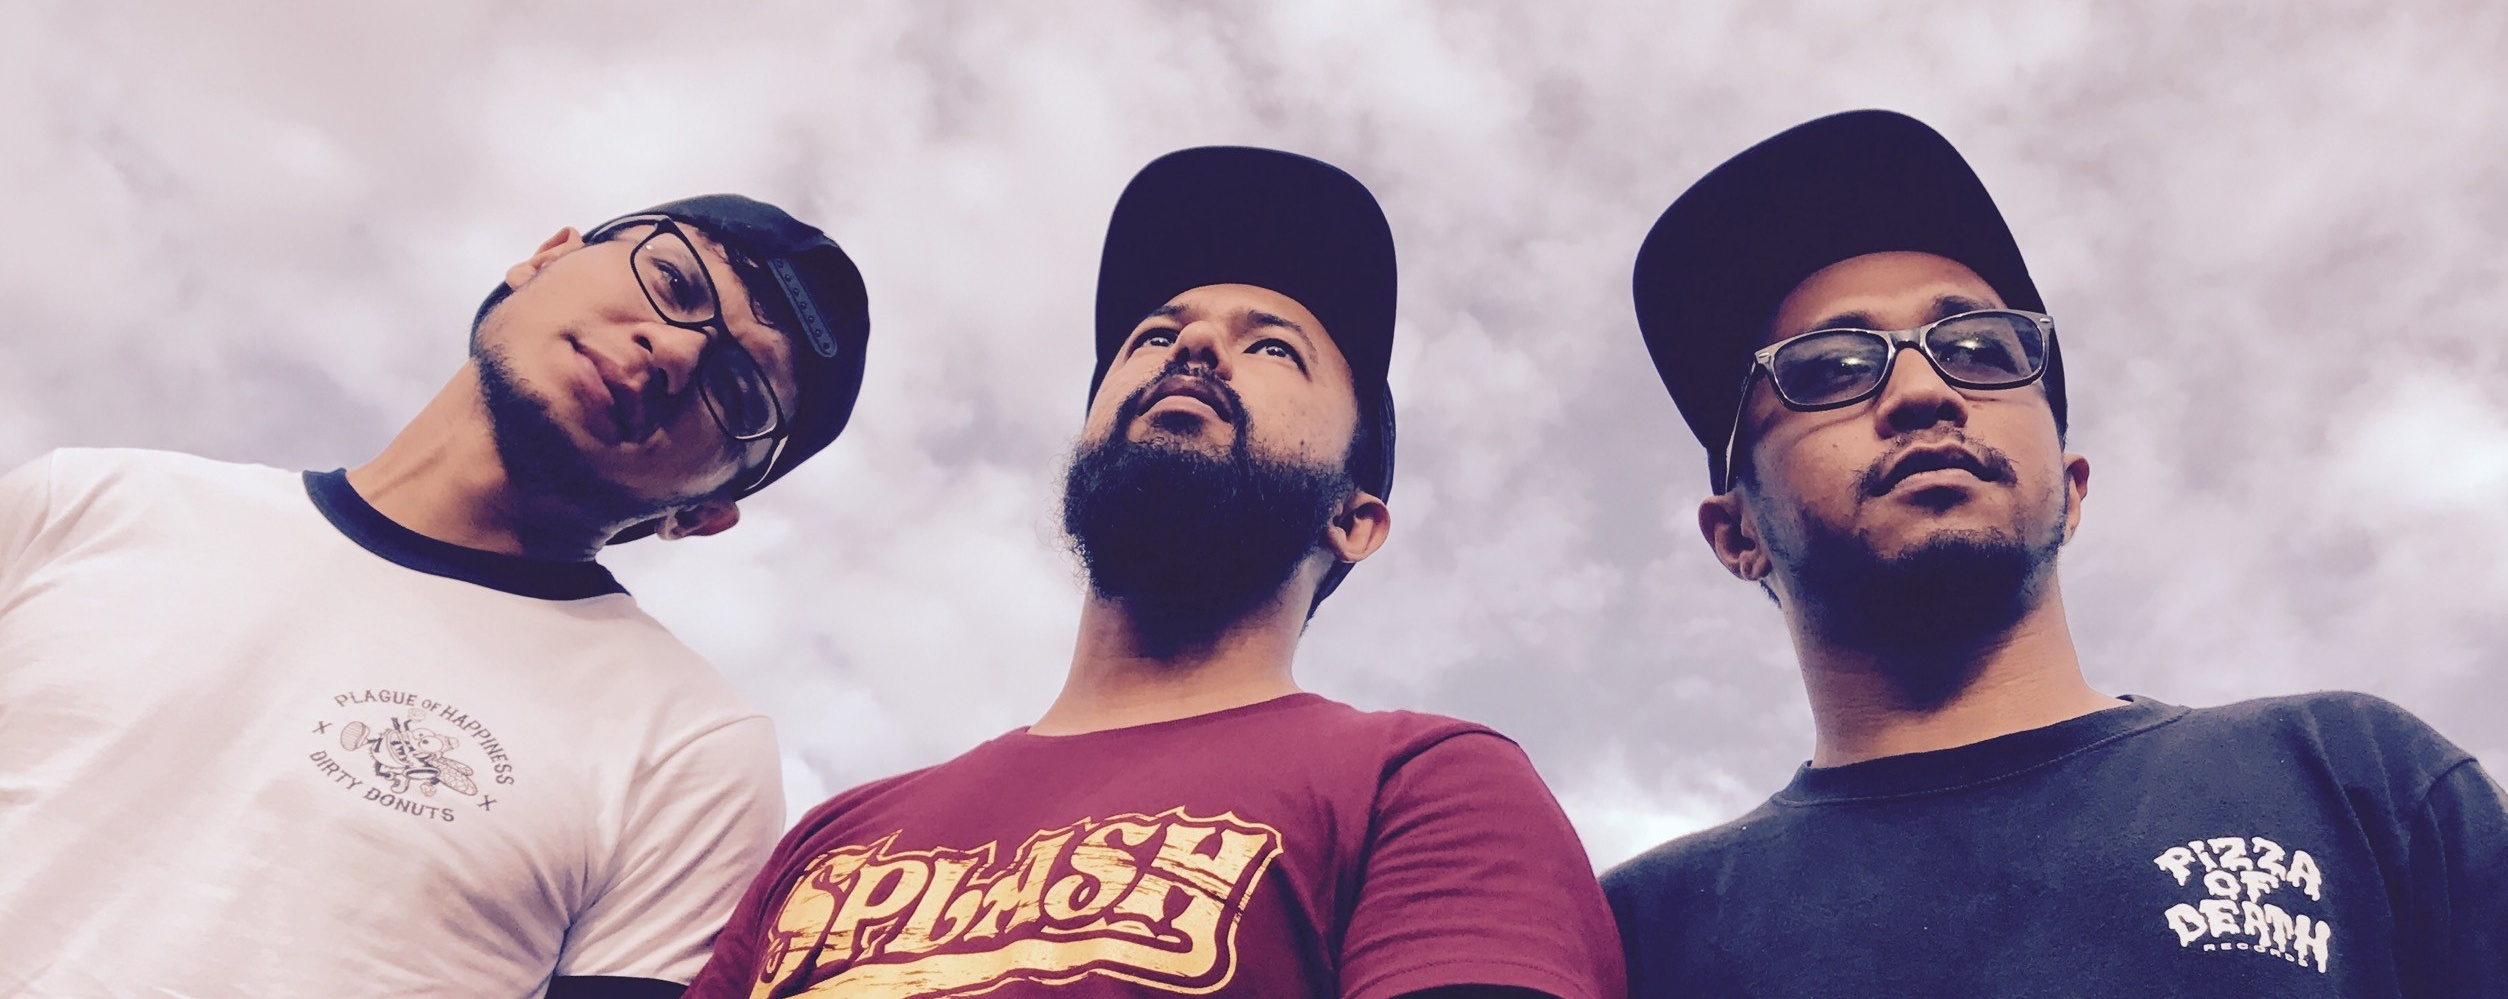 Esplanade Presents: Red Dot August - Iman's League